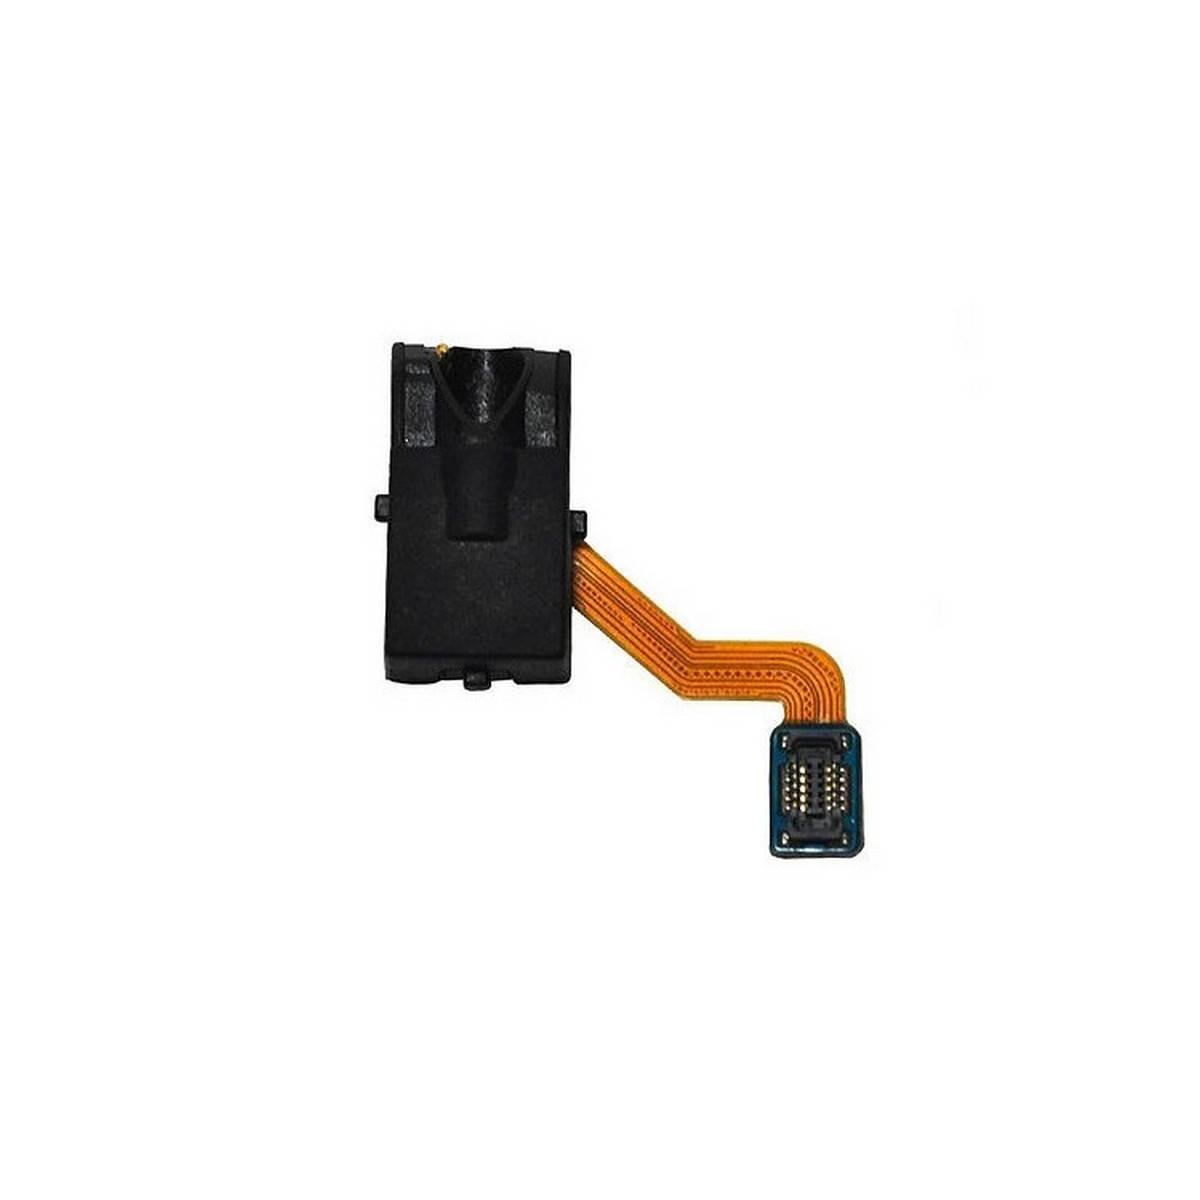 Conector fone de ouvido, jack para Samsung Galaxy S4 mini, I9190,I9195